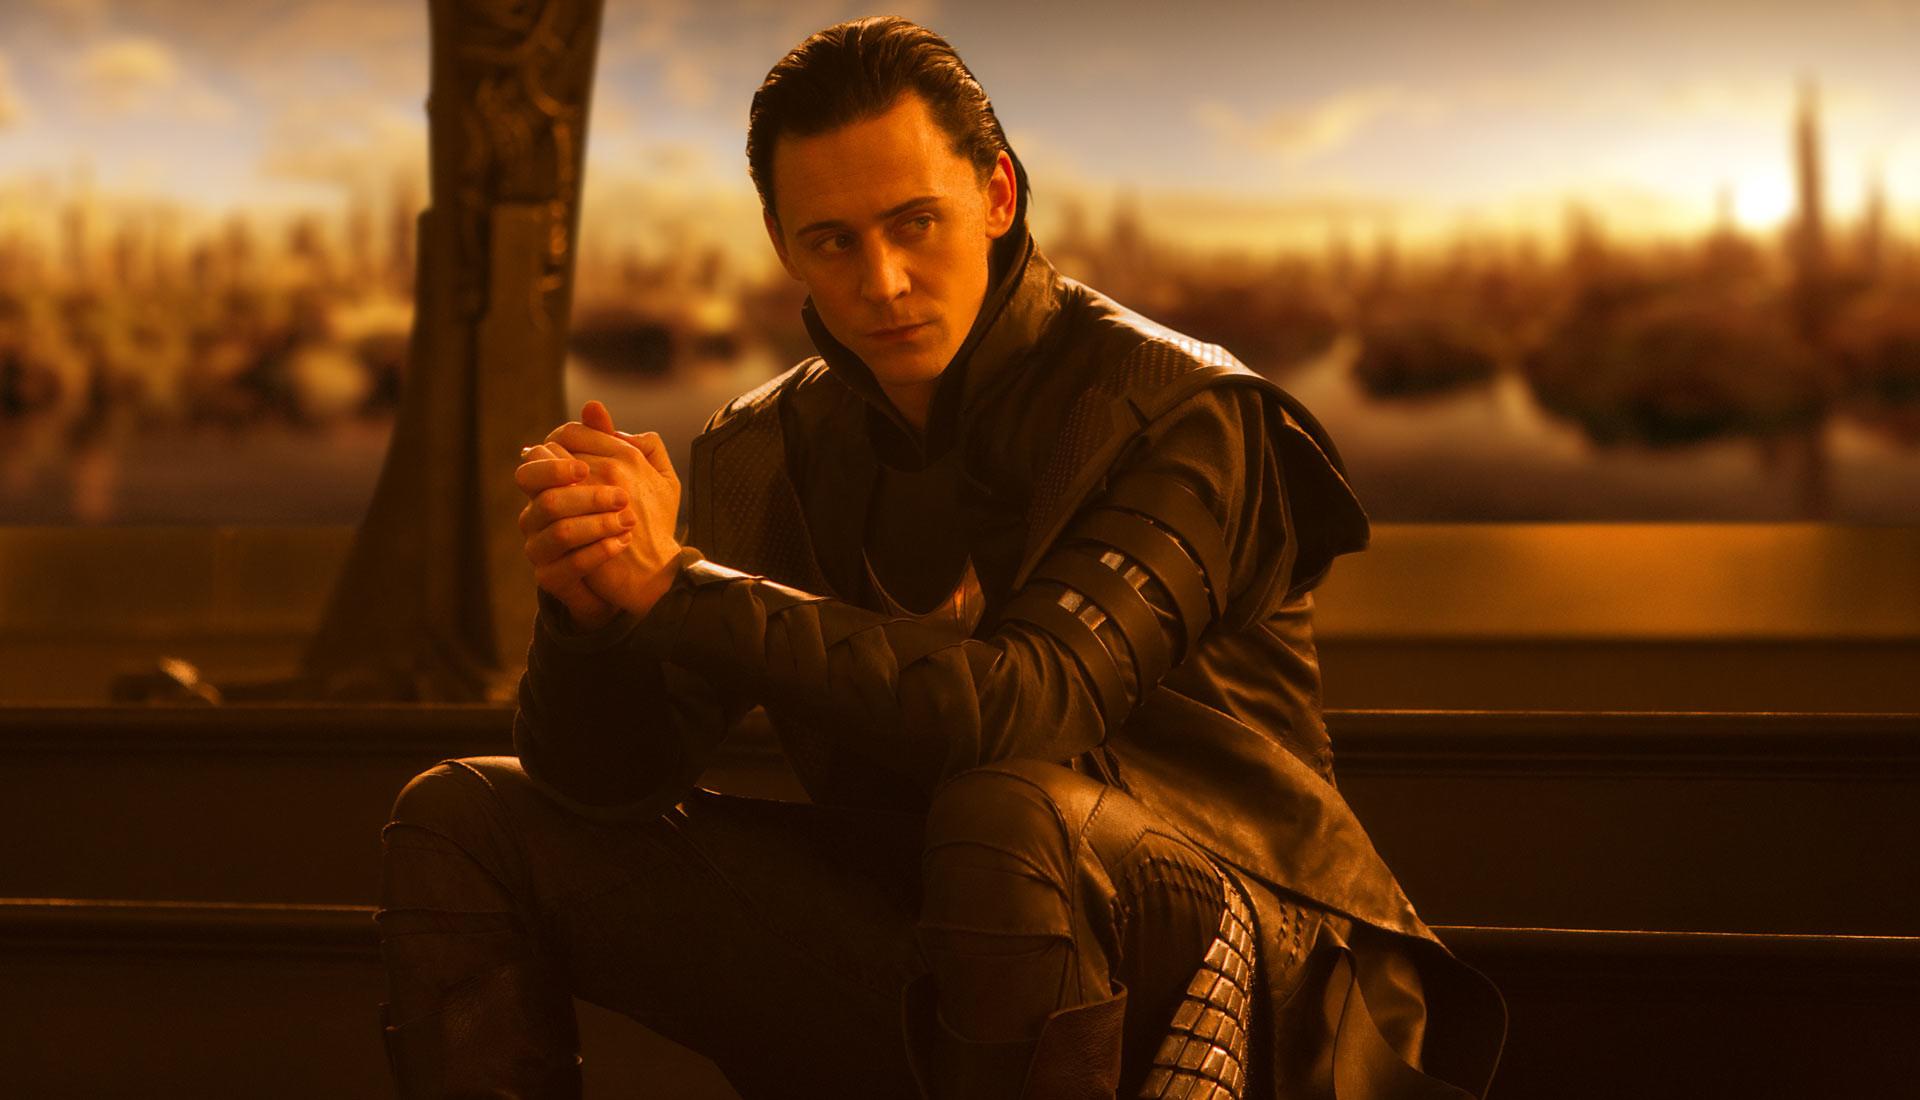 Res: 1920x1100, Loki-Thor-Movie-Wallpaper-5-1-.jpg